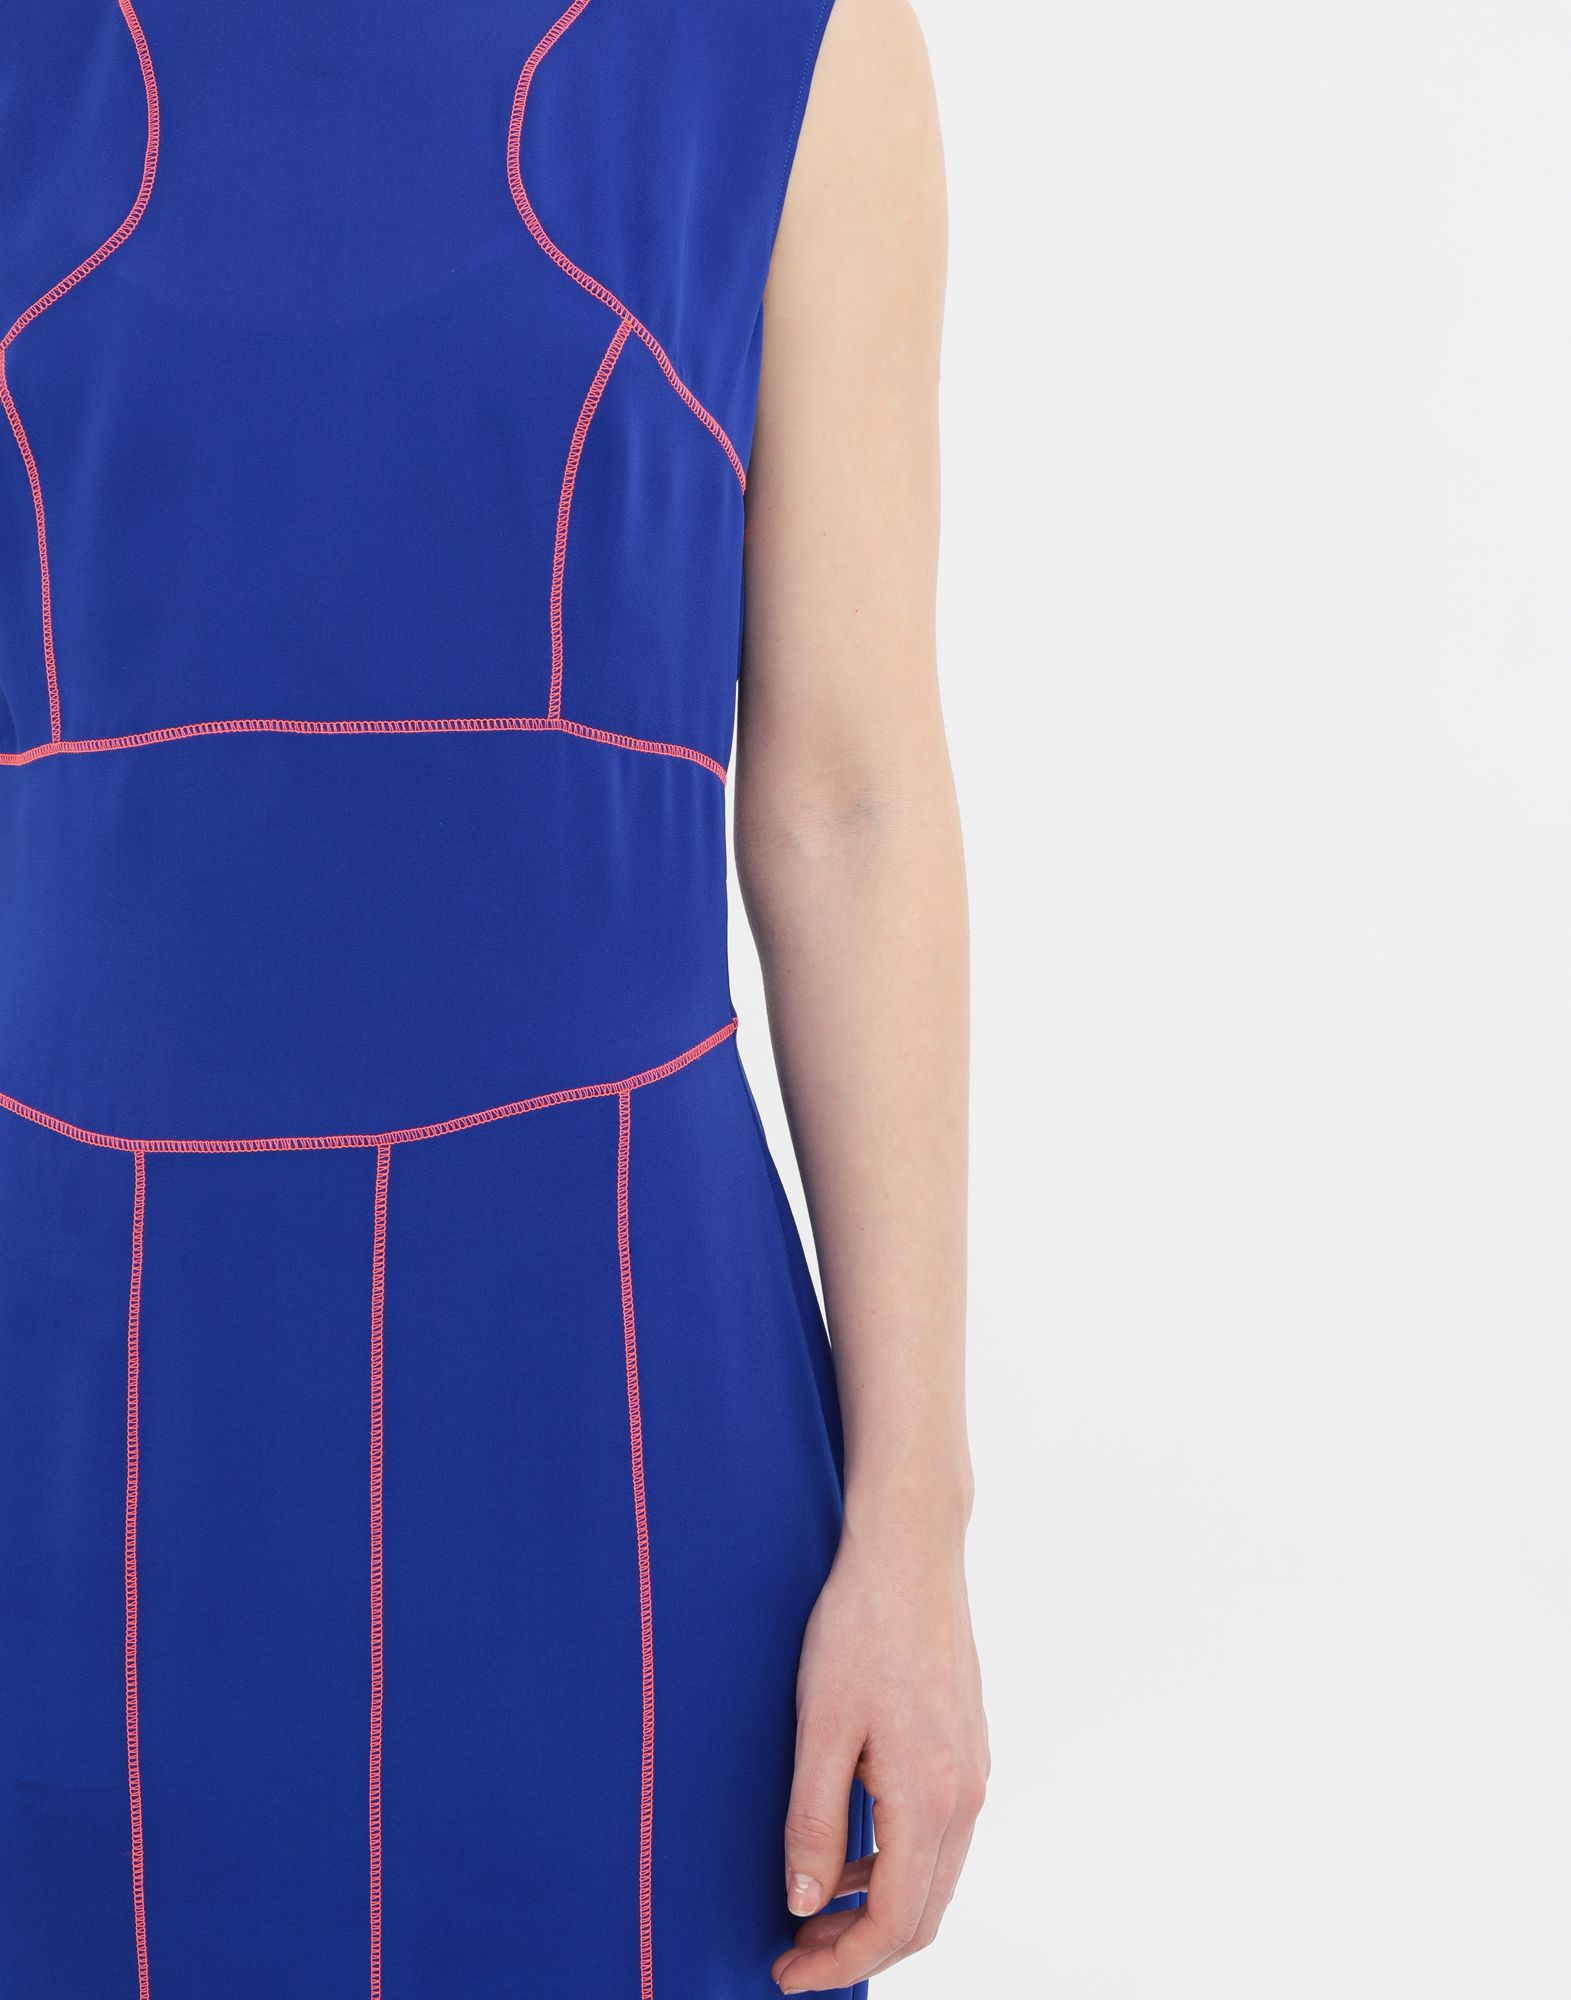 MAISON MARGIELA Stitch-jacquard silk georgette maxi dress Long dress Woman a